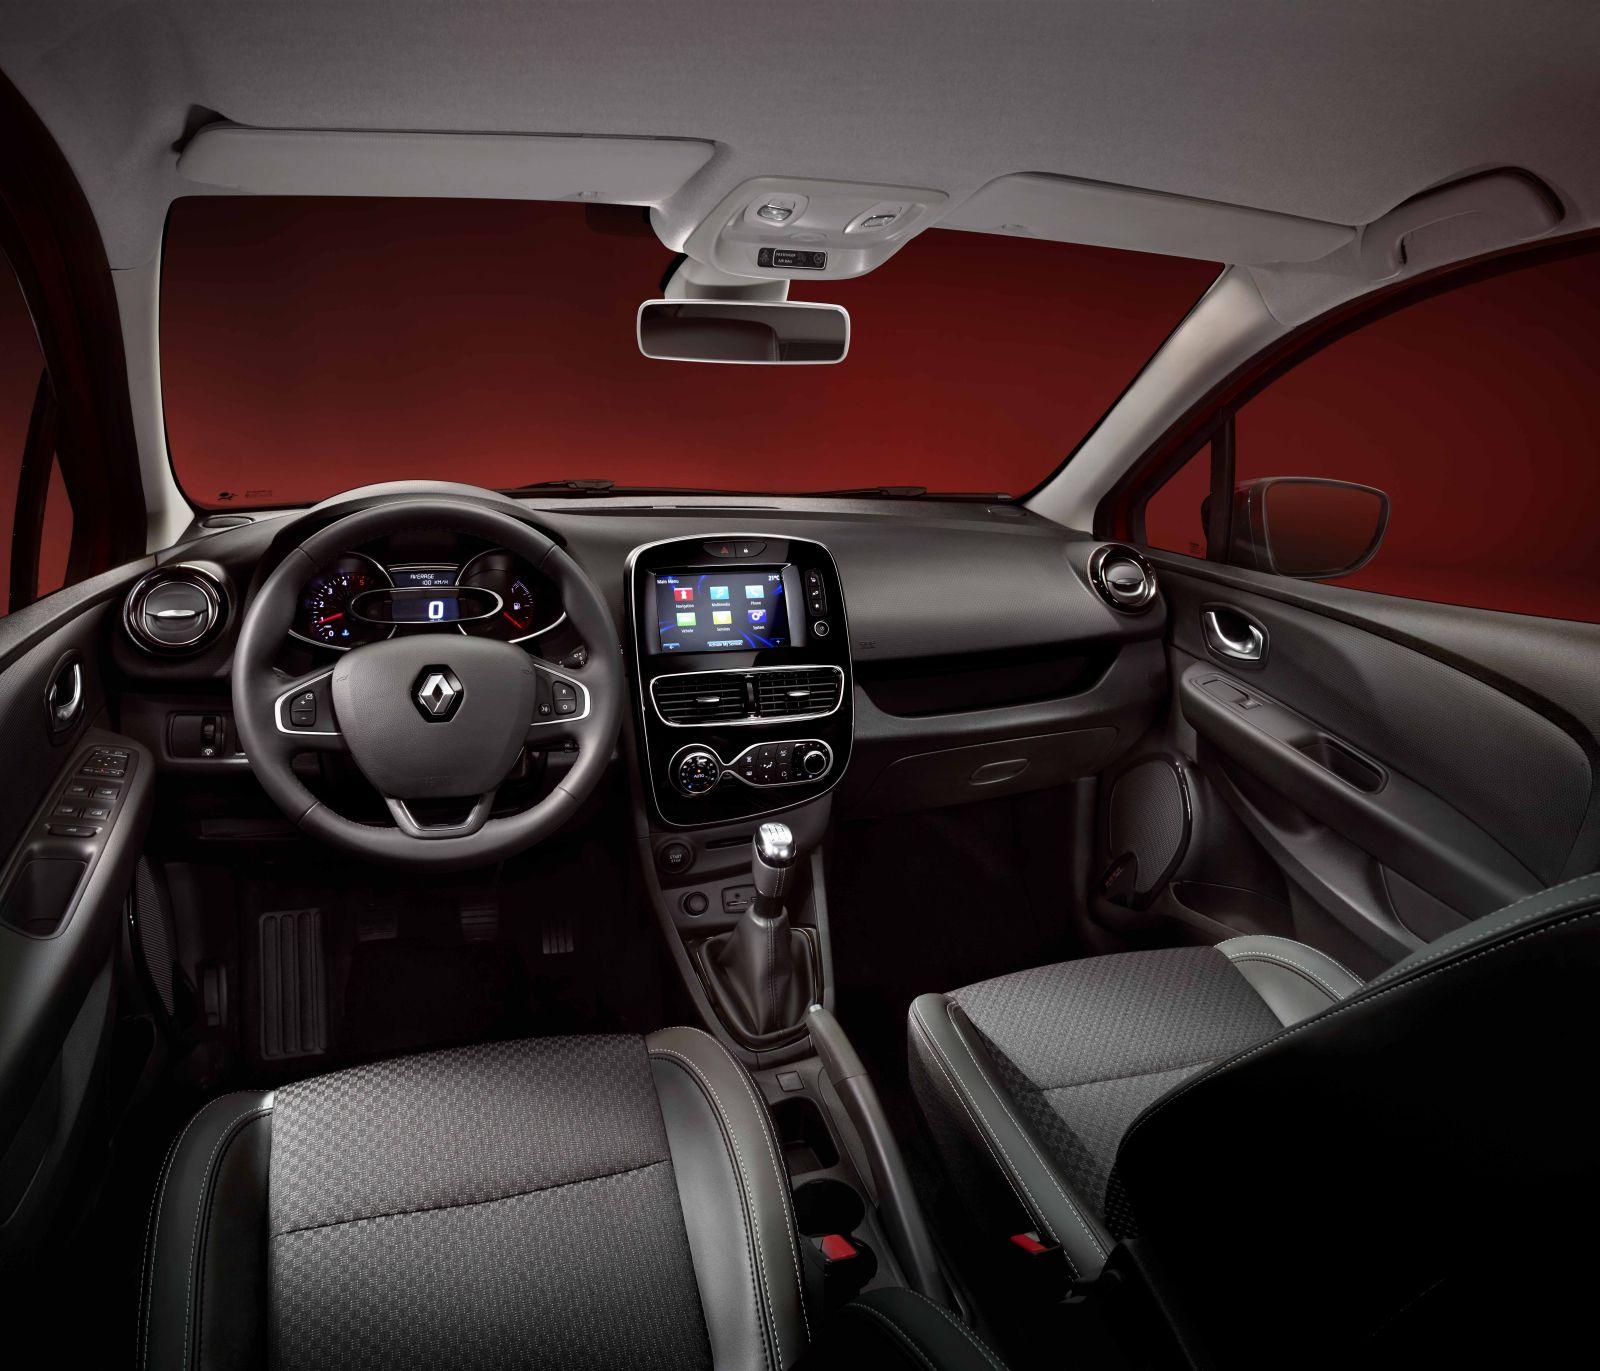 New 2017 Renault Clio (15)